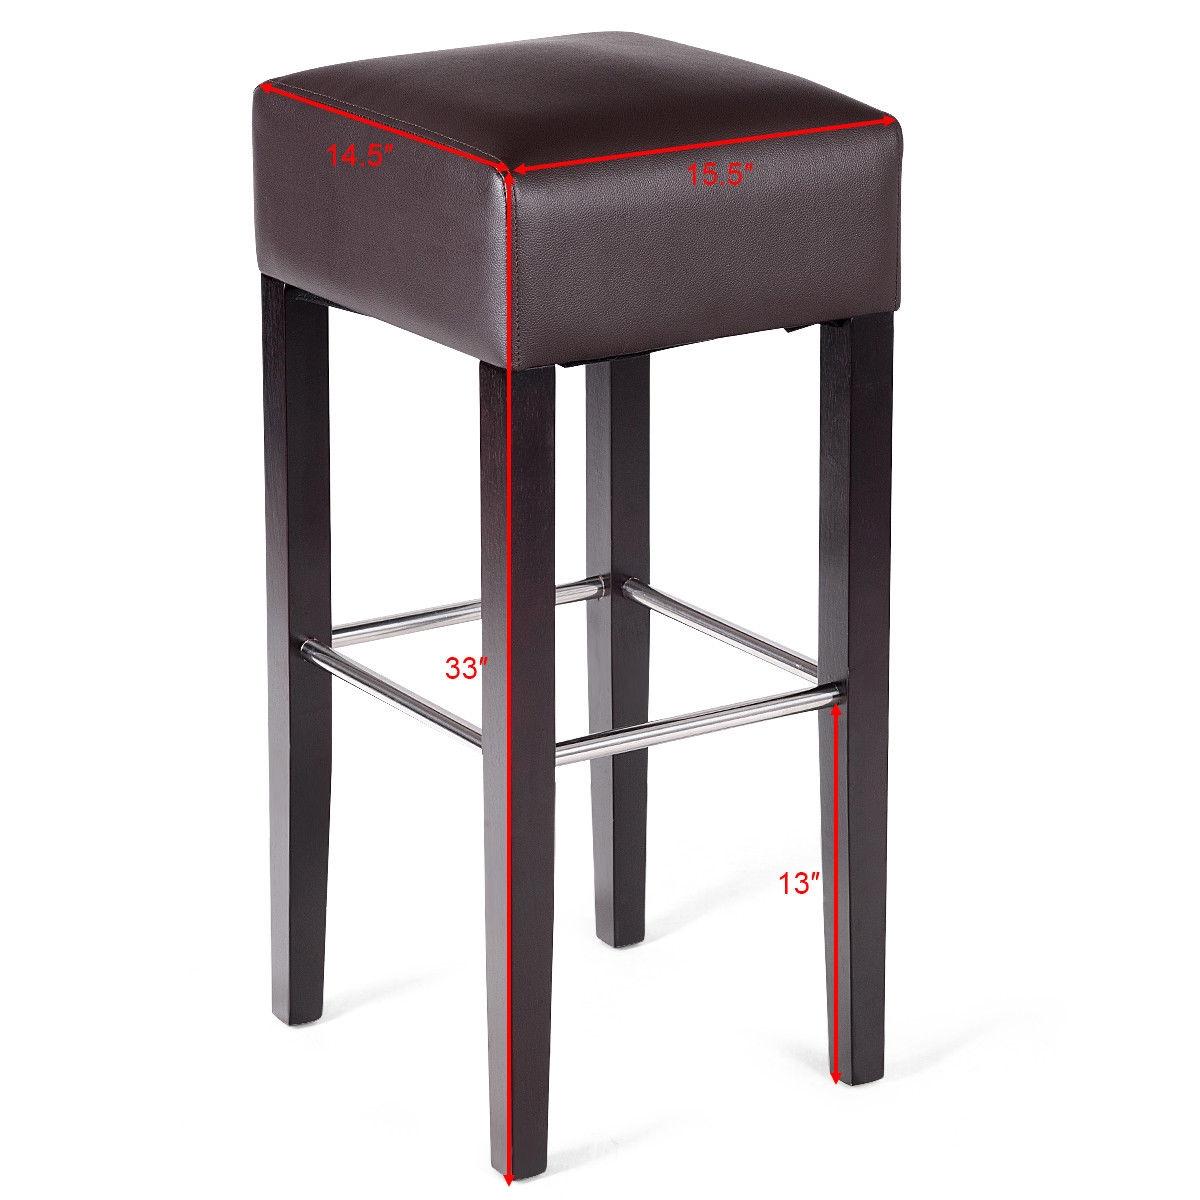 1 PC Backless Bar Stool PVC Seat Rubber Wood Legs Pub Kitchen Dining Black-Brown